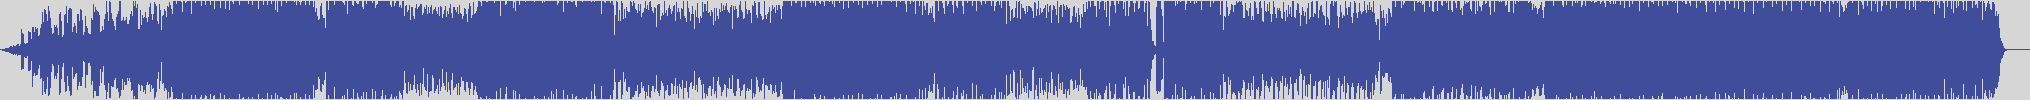 smilax_dig_records [Smilax_X448DIG] Baby Rey, Gabriela - Hula Hula [Club Edit] audio wave form